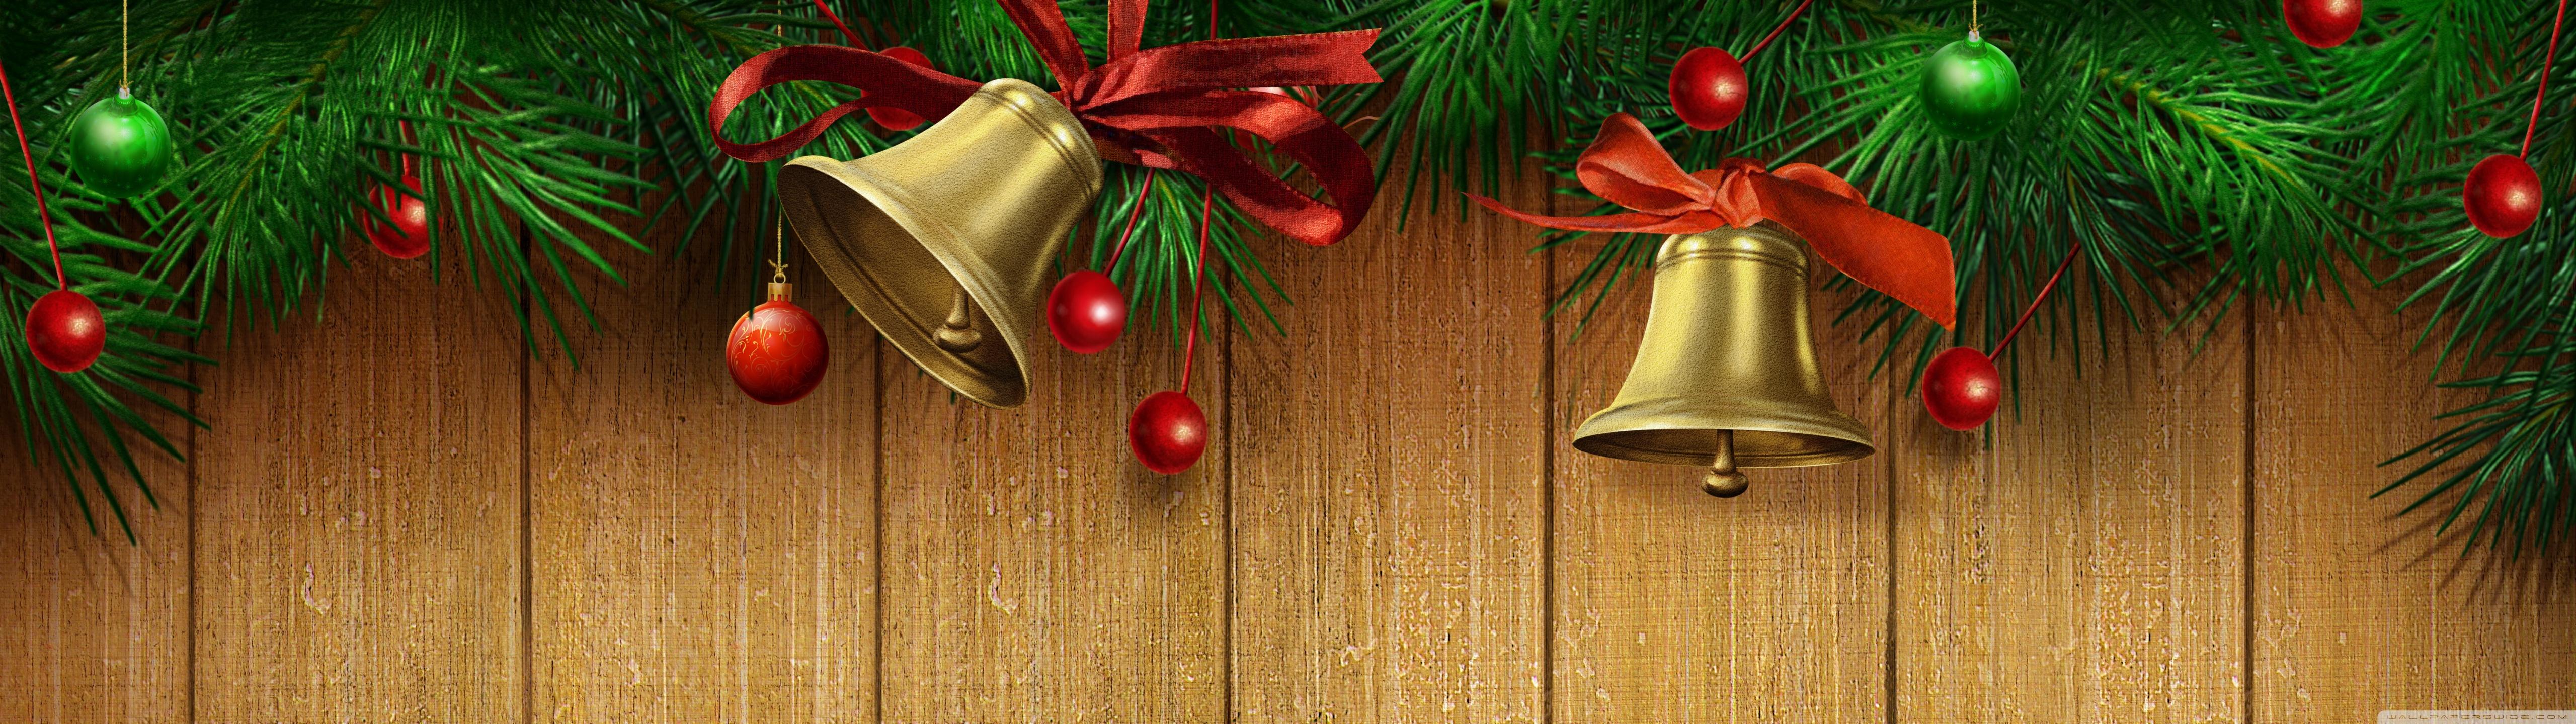 3840x1080 Christmas Wallpaper